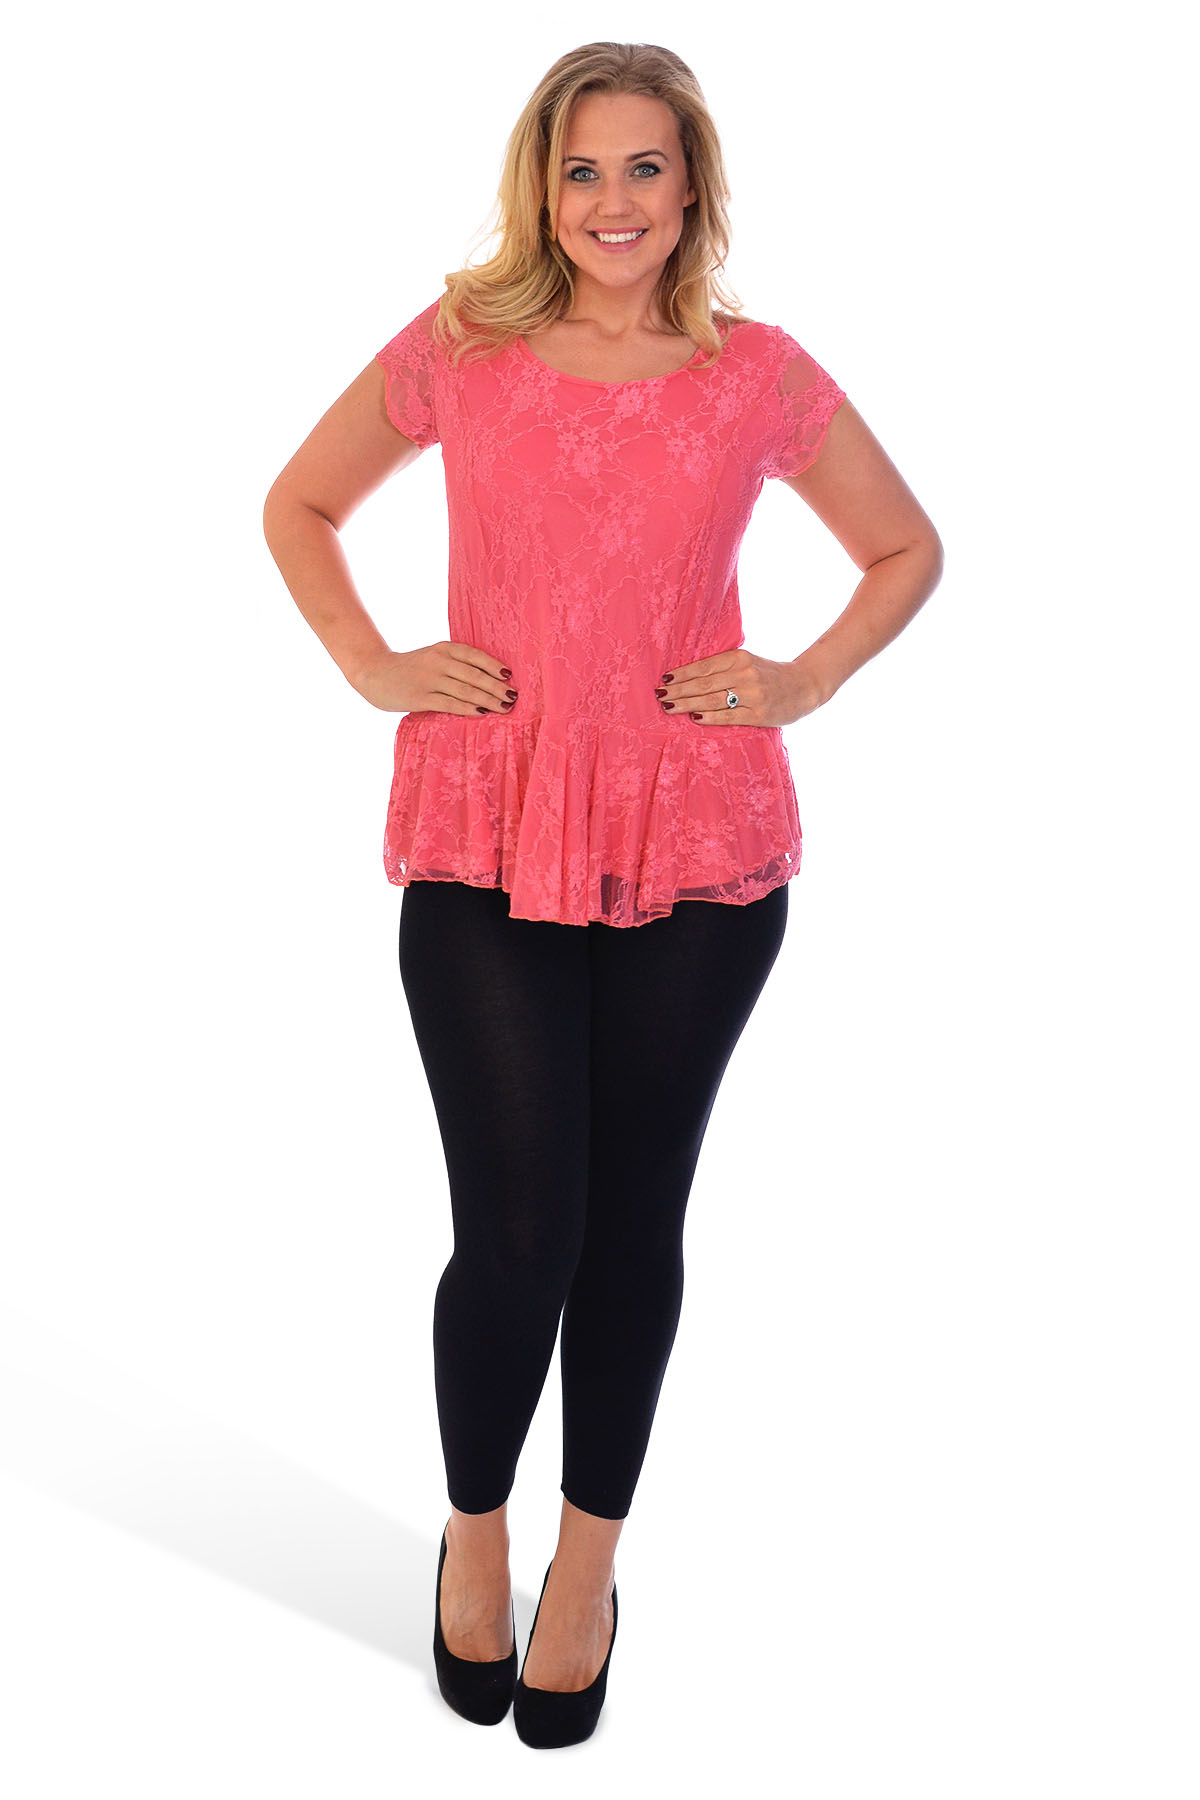 New Womens Plus Size Lace Top Ladies Lined Peplum Style Blouse Sale Nouvelle